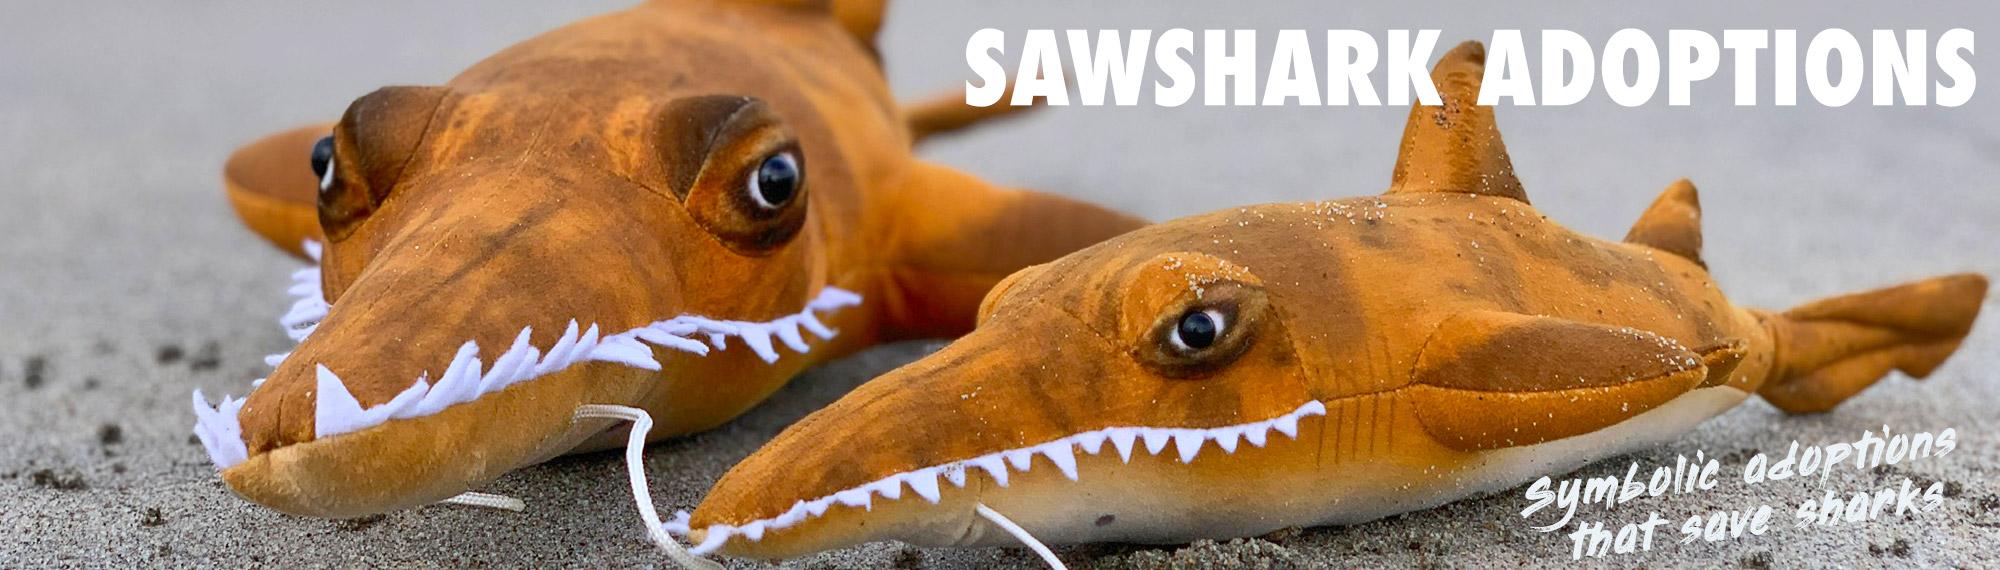 category-banner-adoptions-sawsharks-symbolic.jpg